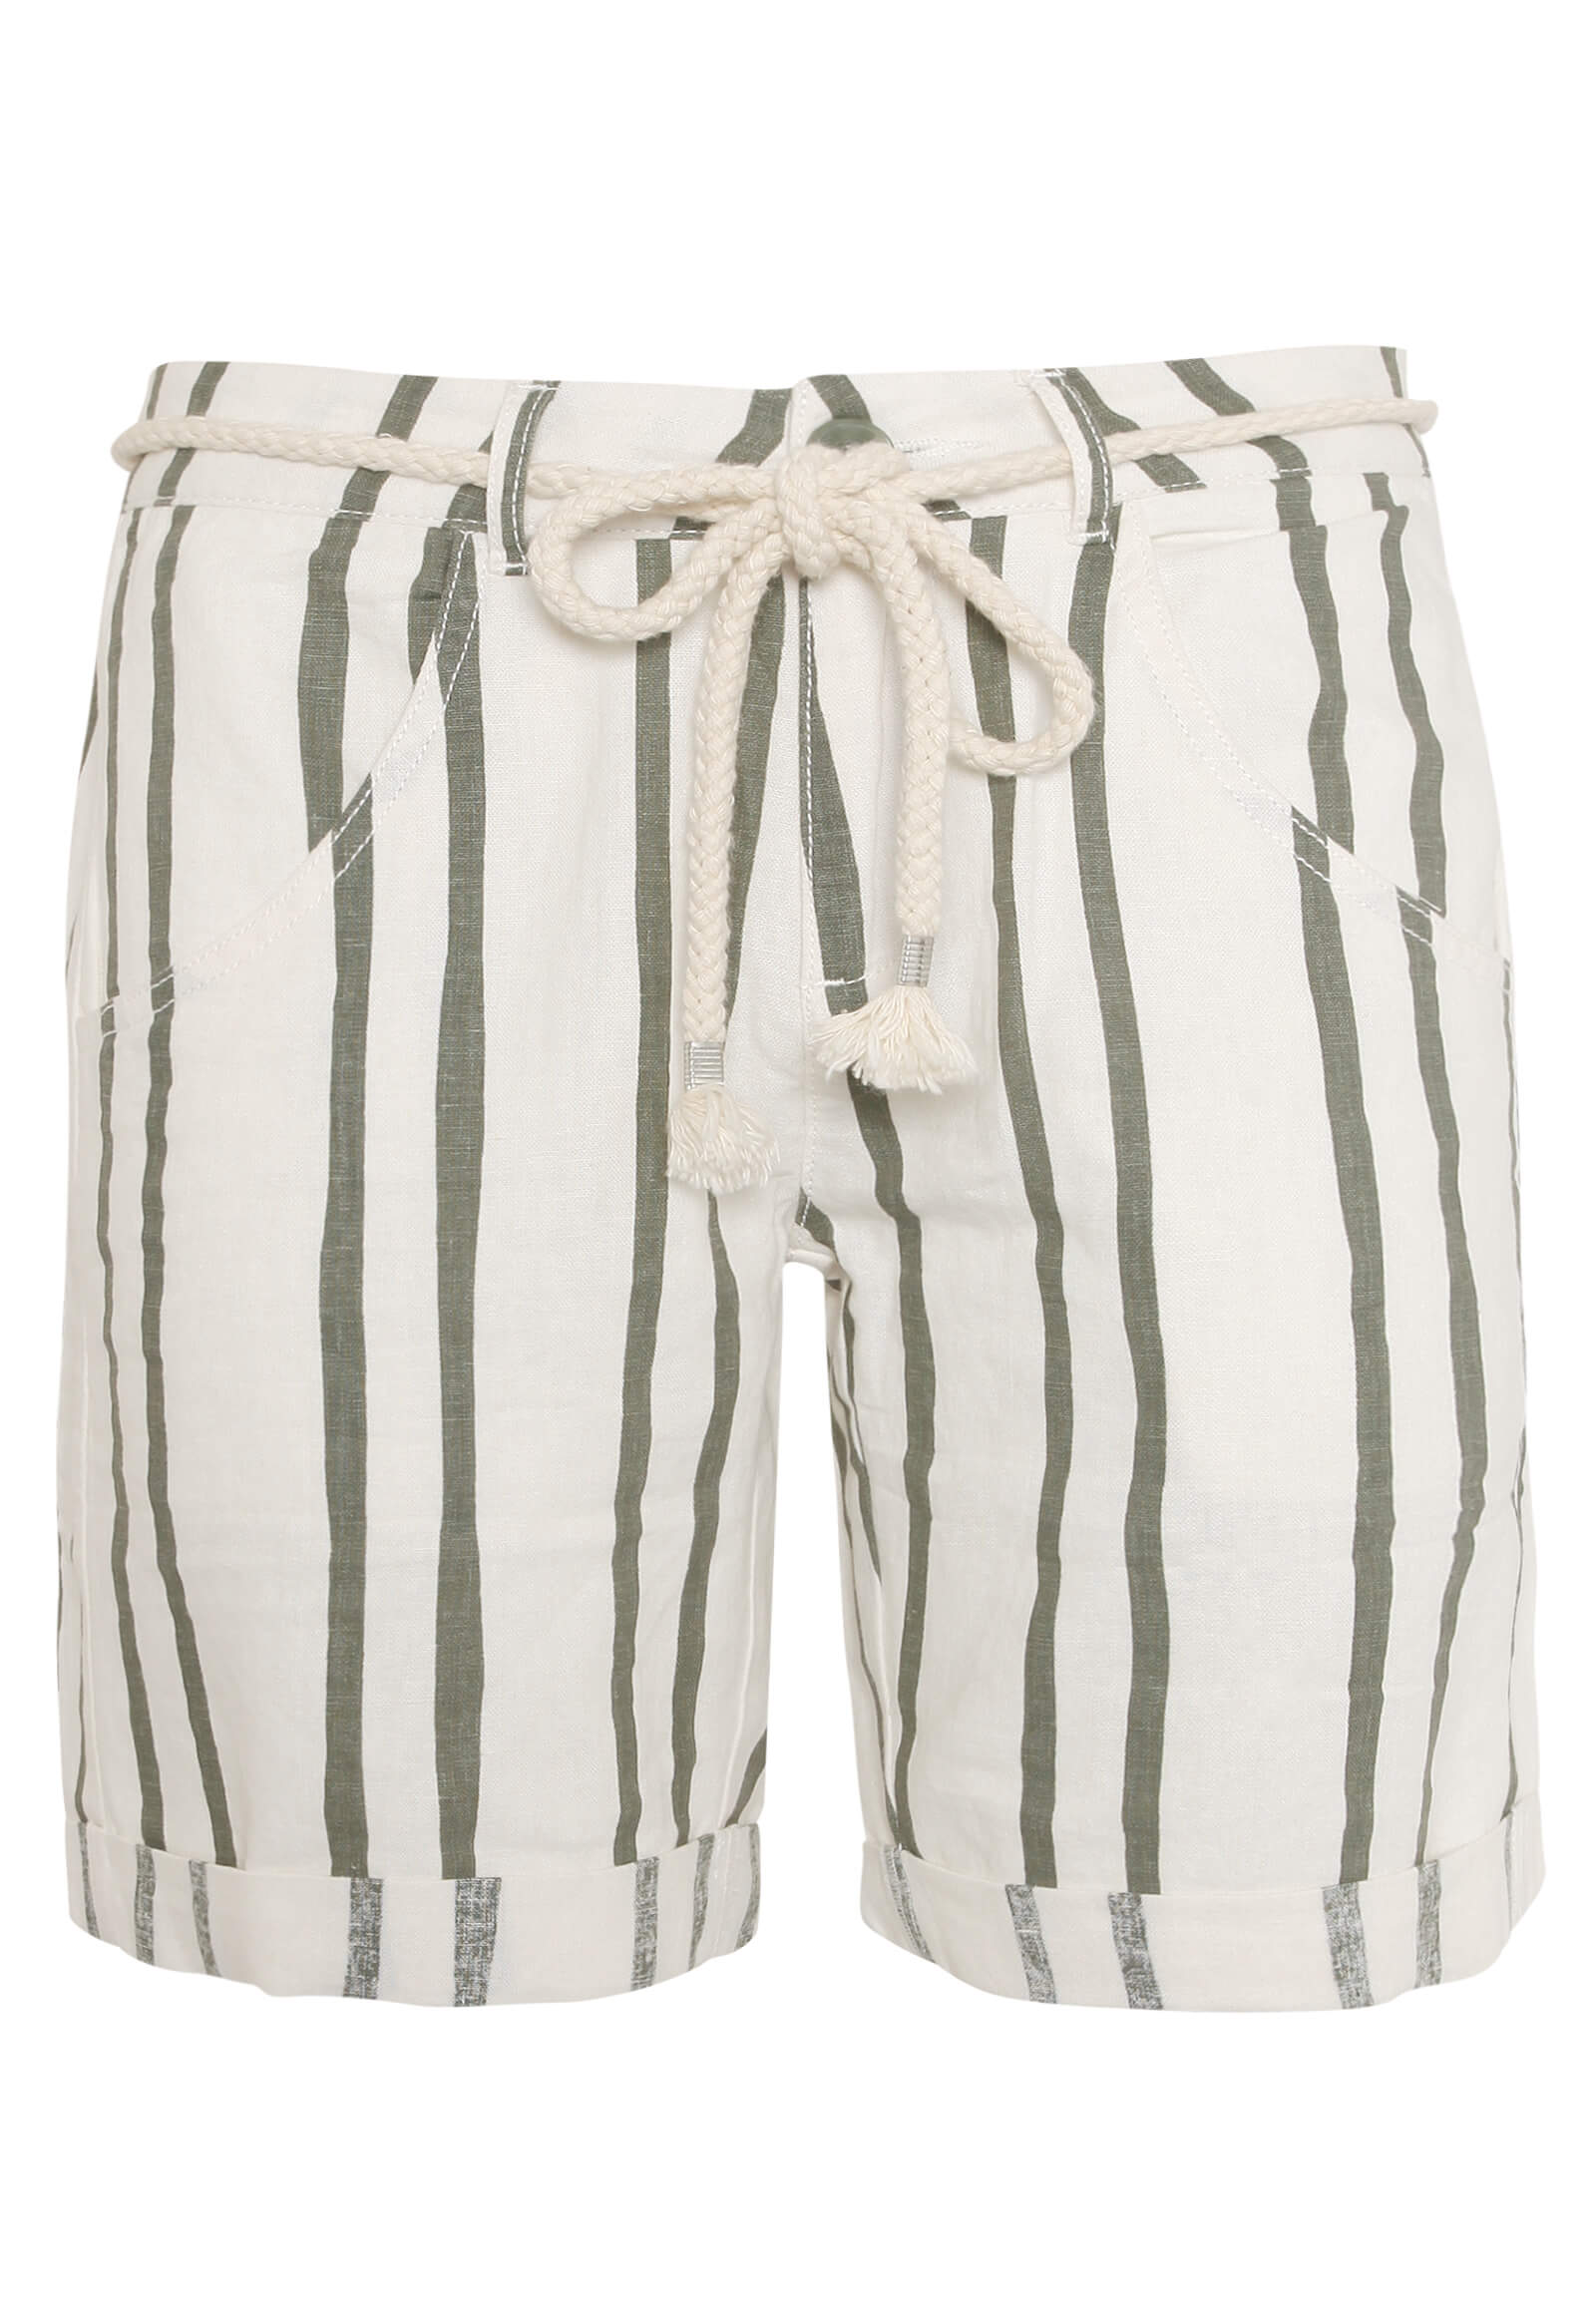 gestreifte Leinen-Shorts